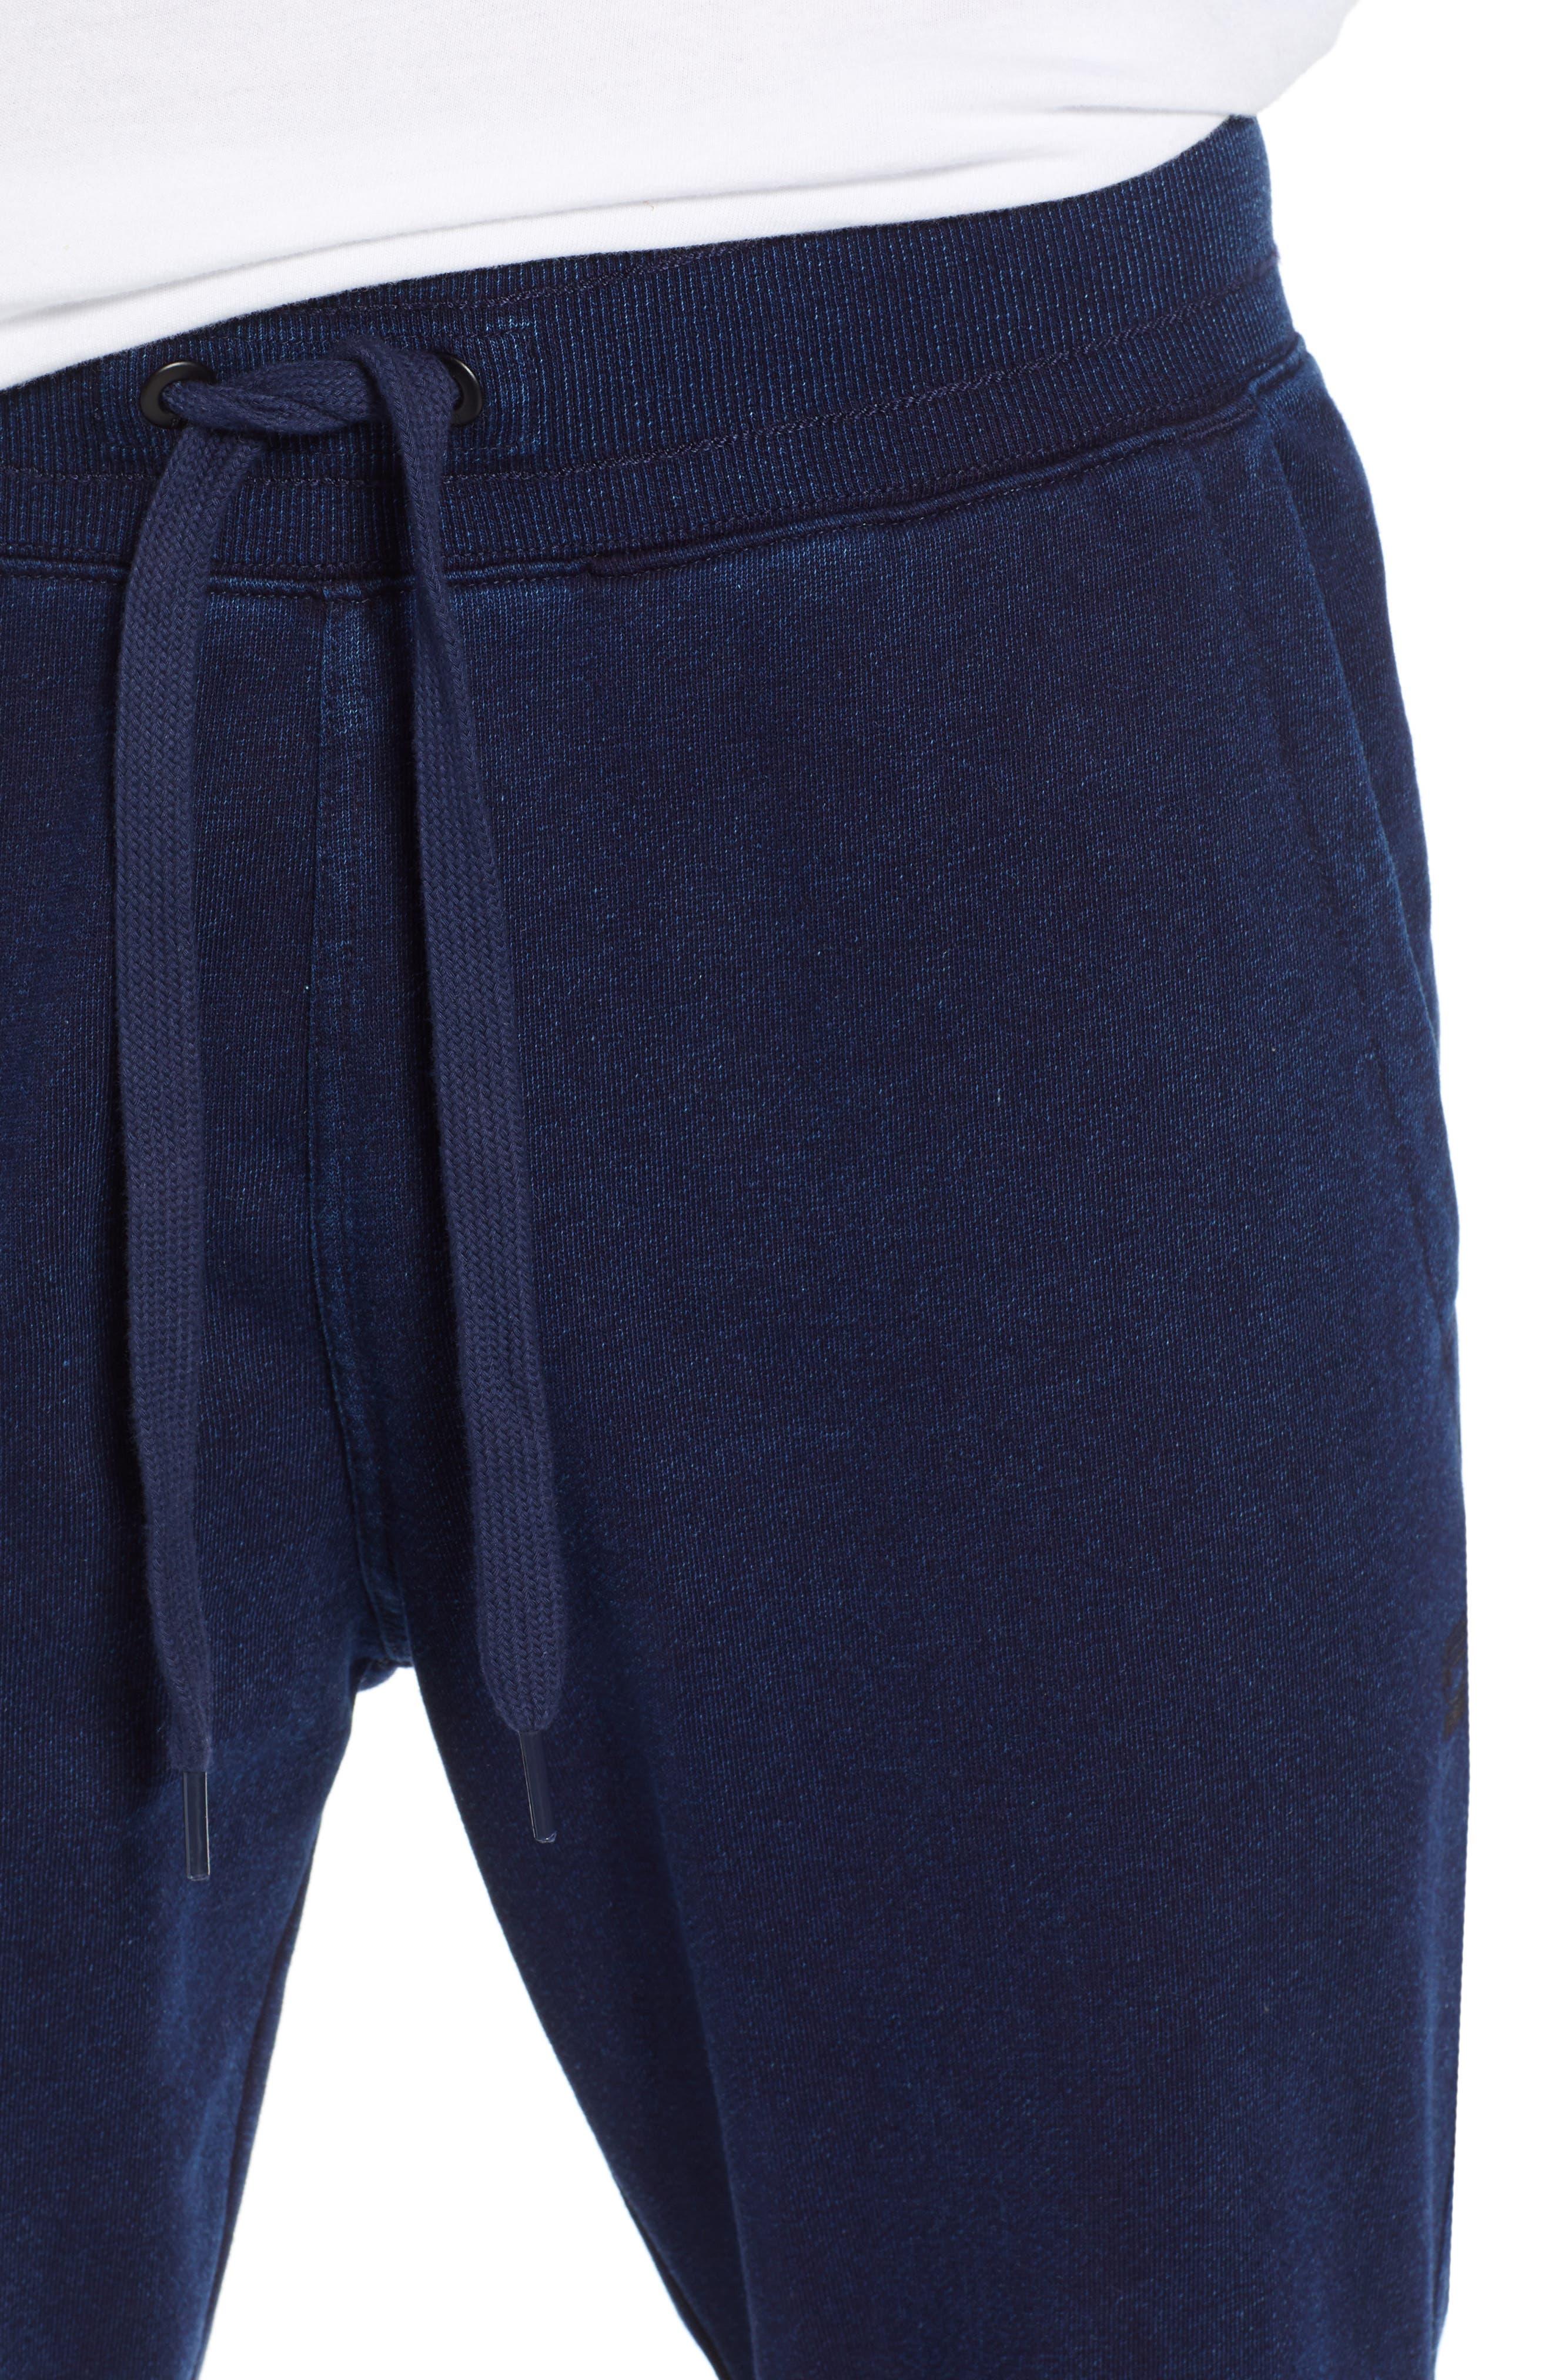 G-STAR RAW,                             Motac-X Slim Fit Sweat Pants,                             Alternate thumbnail 4, color,                             001